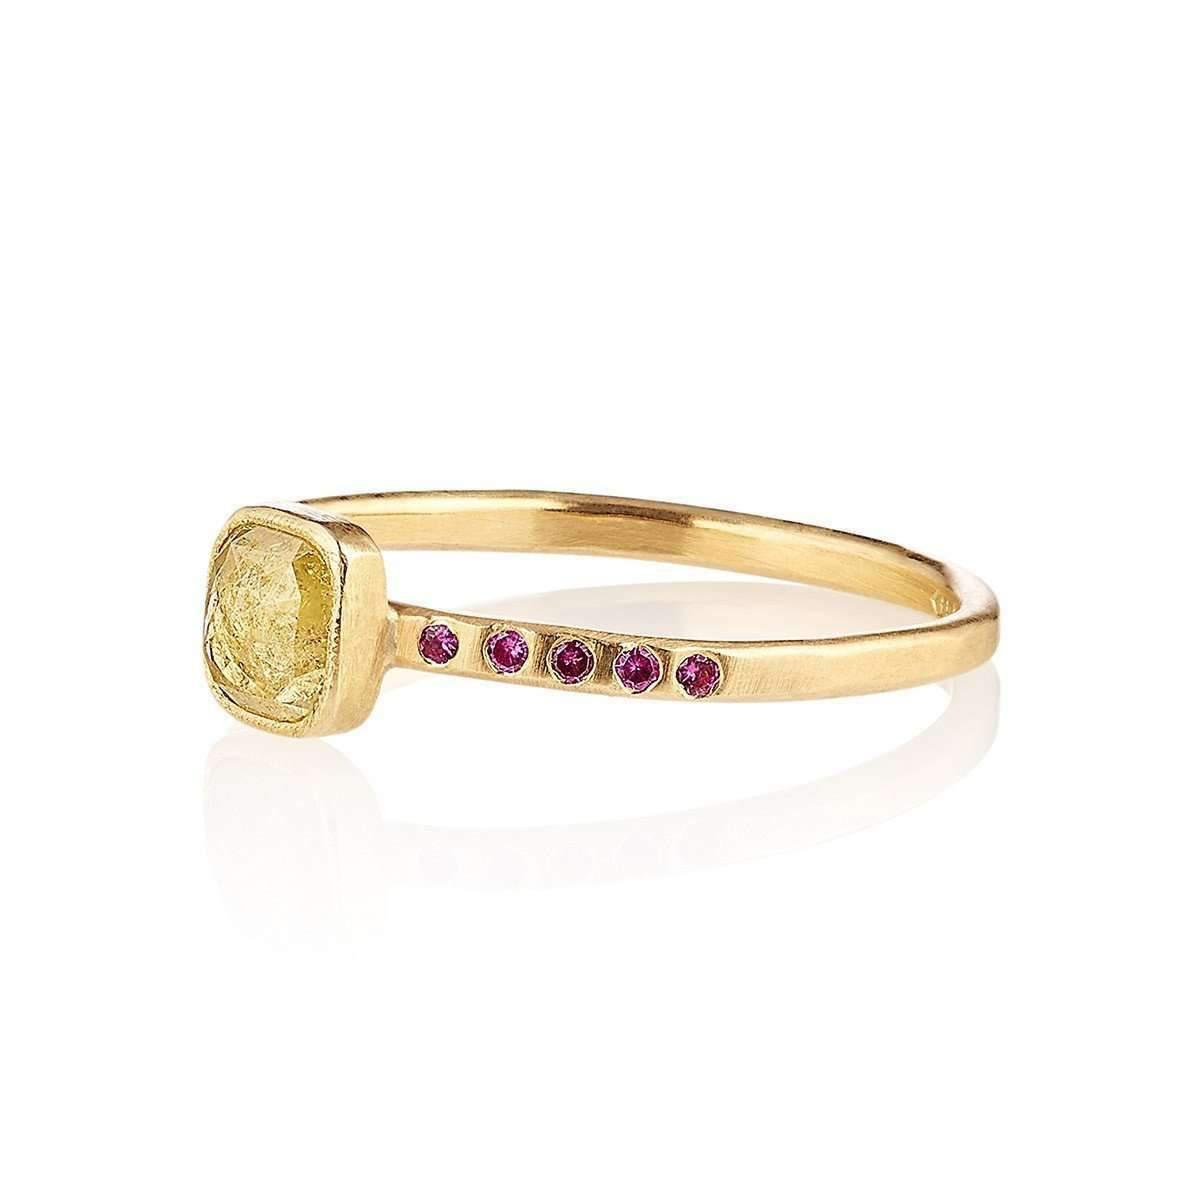 Shakti Ellenwood 18kt Fairtrade Dora Diamond Ring - UK N - US 6 1/2 - EU 54 PhgFYaUOpJ